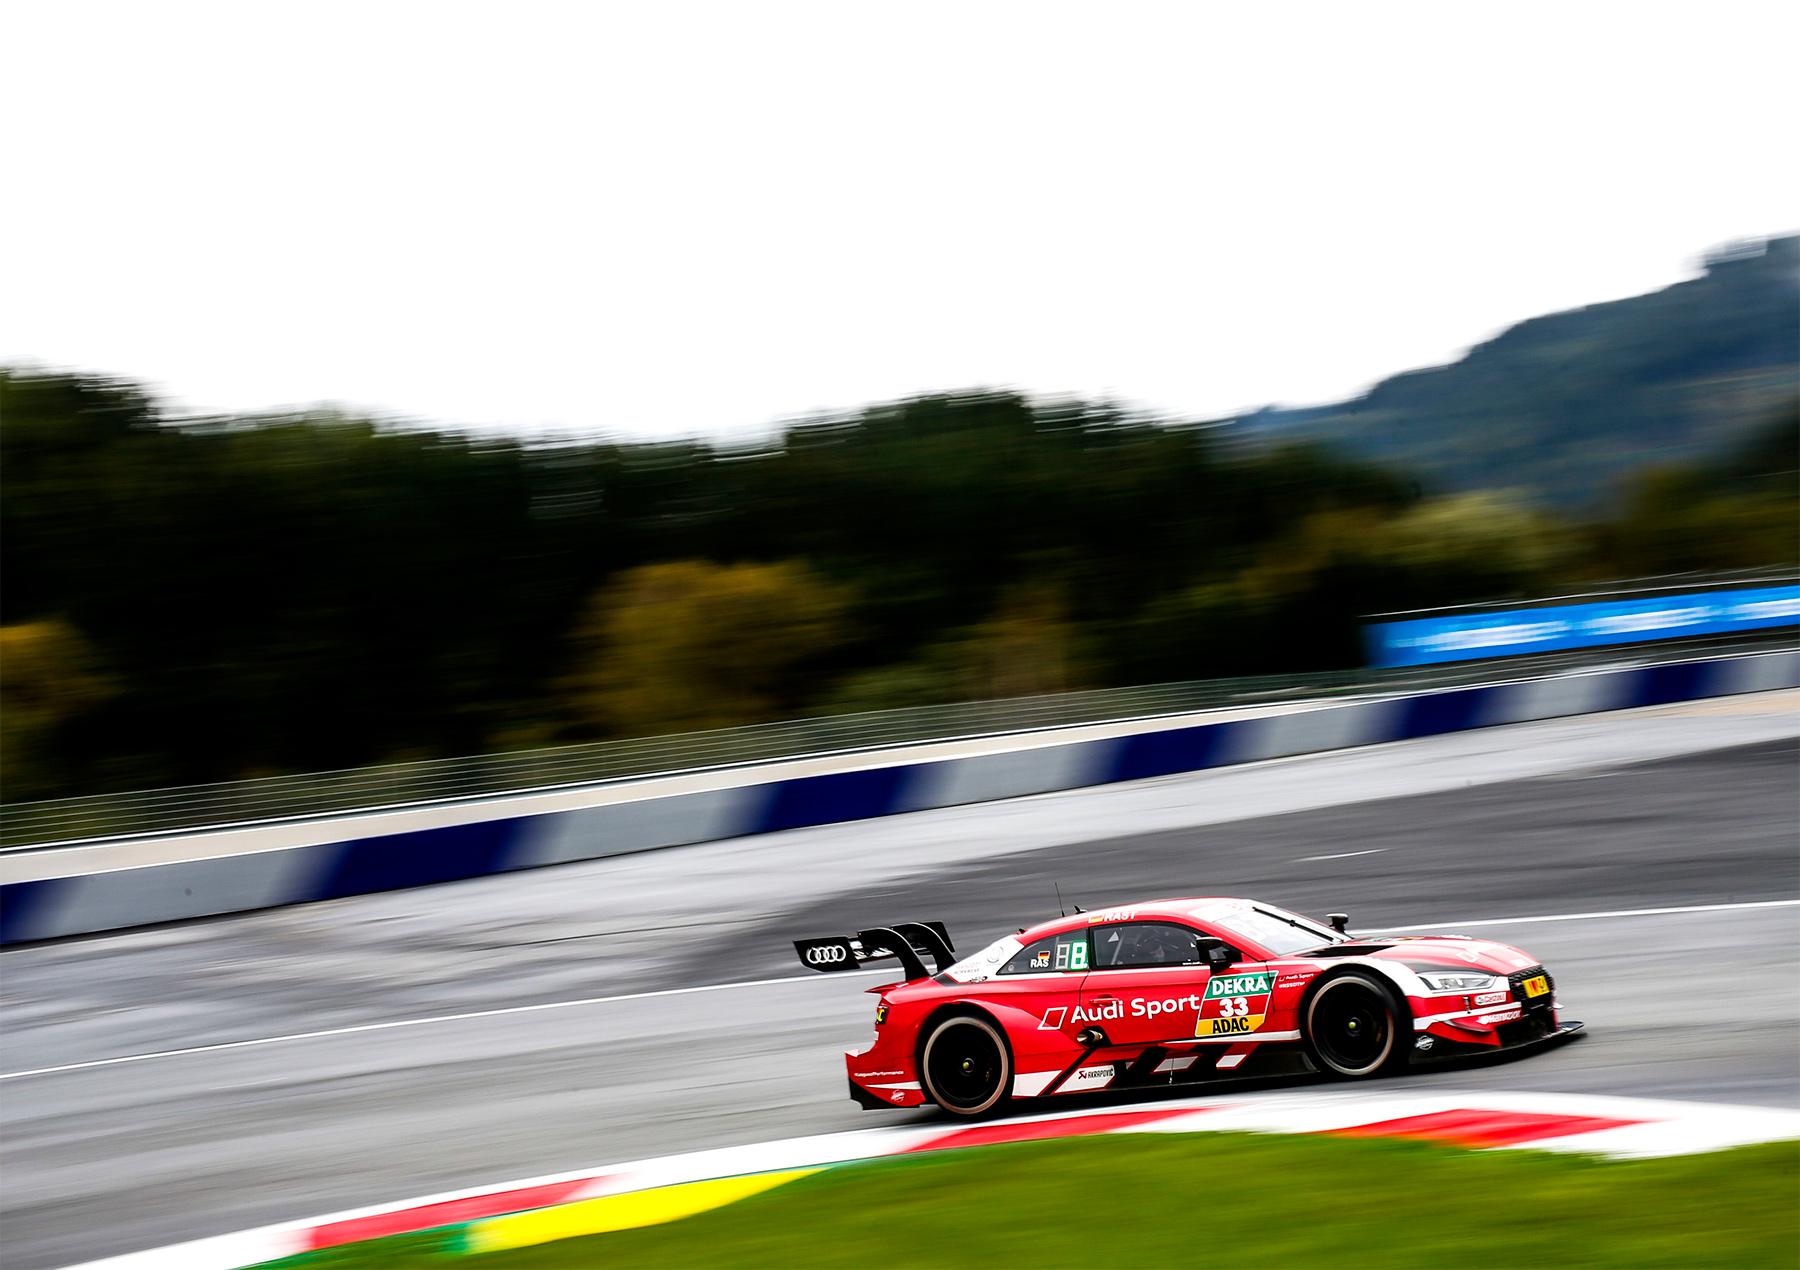 TrackWorthy - No. 33 Rene Rast Audi RS 5 DTM (1)